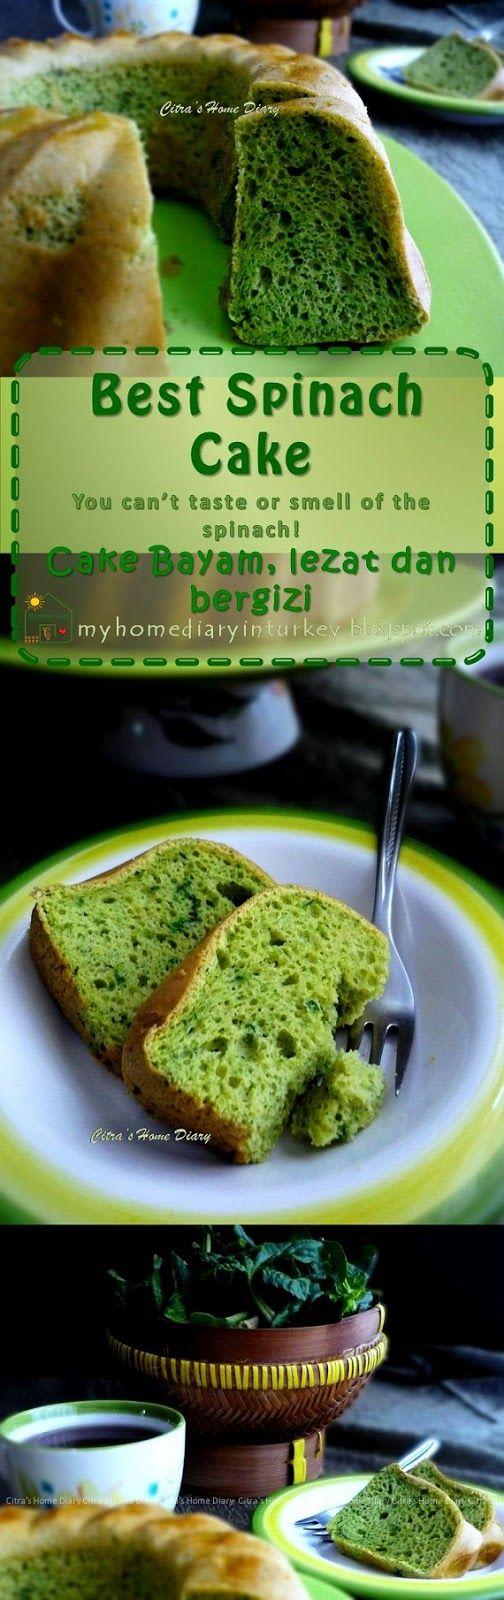 Best Spinach Cake / Cake Bayam, lezat dan bergizi.-Çitra's Home Diary #spinach #spinachcake #cakebayam #ıspanakkek #greenthemecake #kidsmealidea